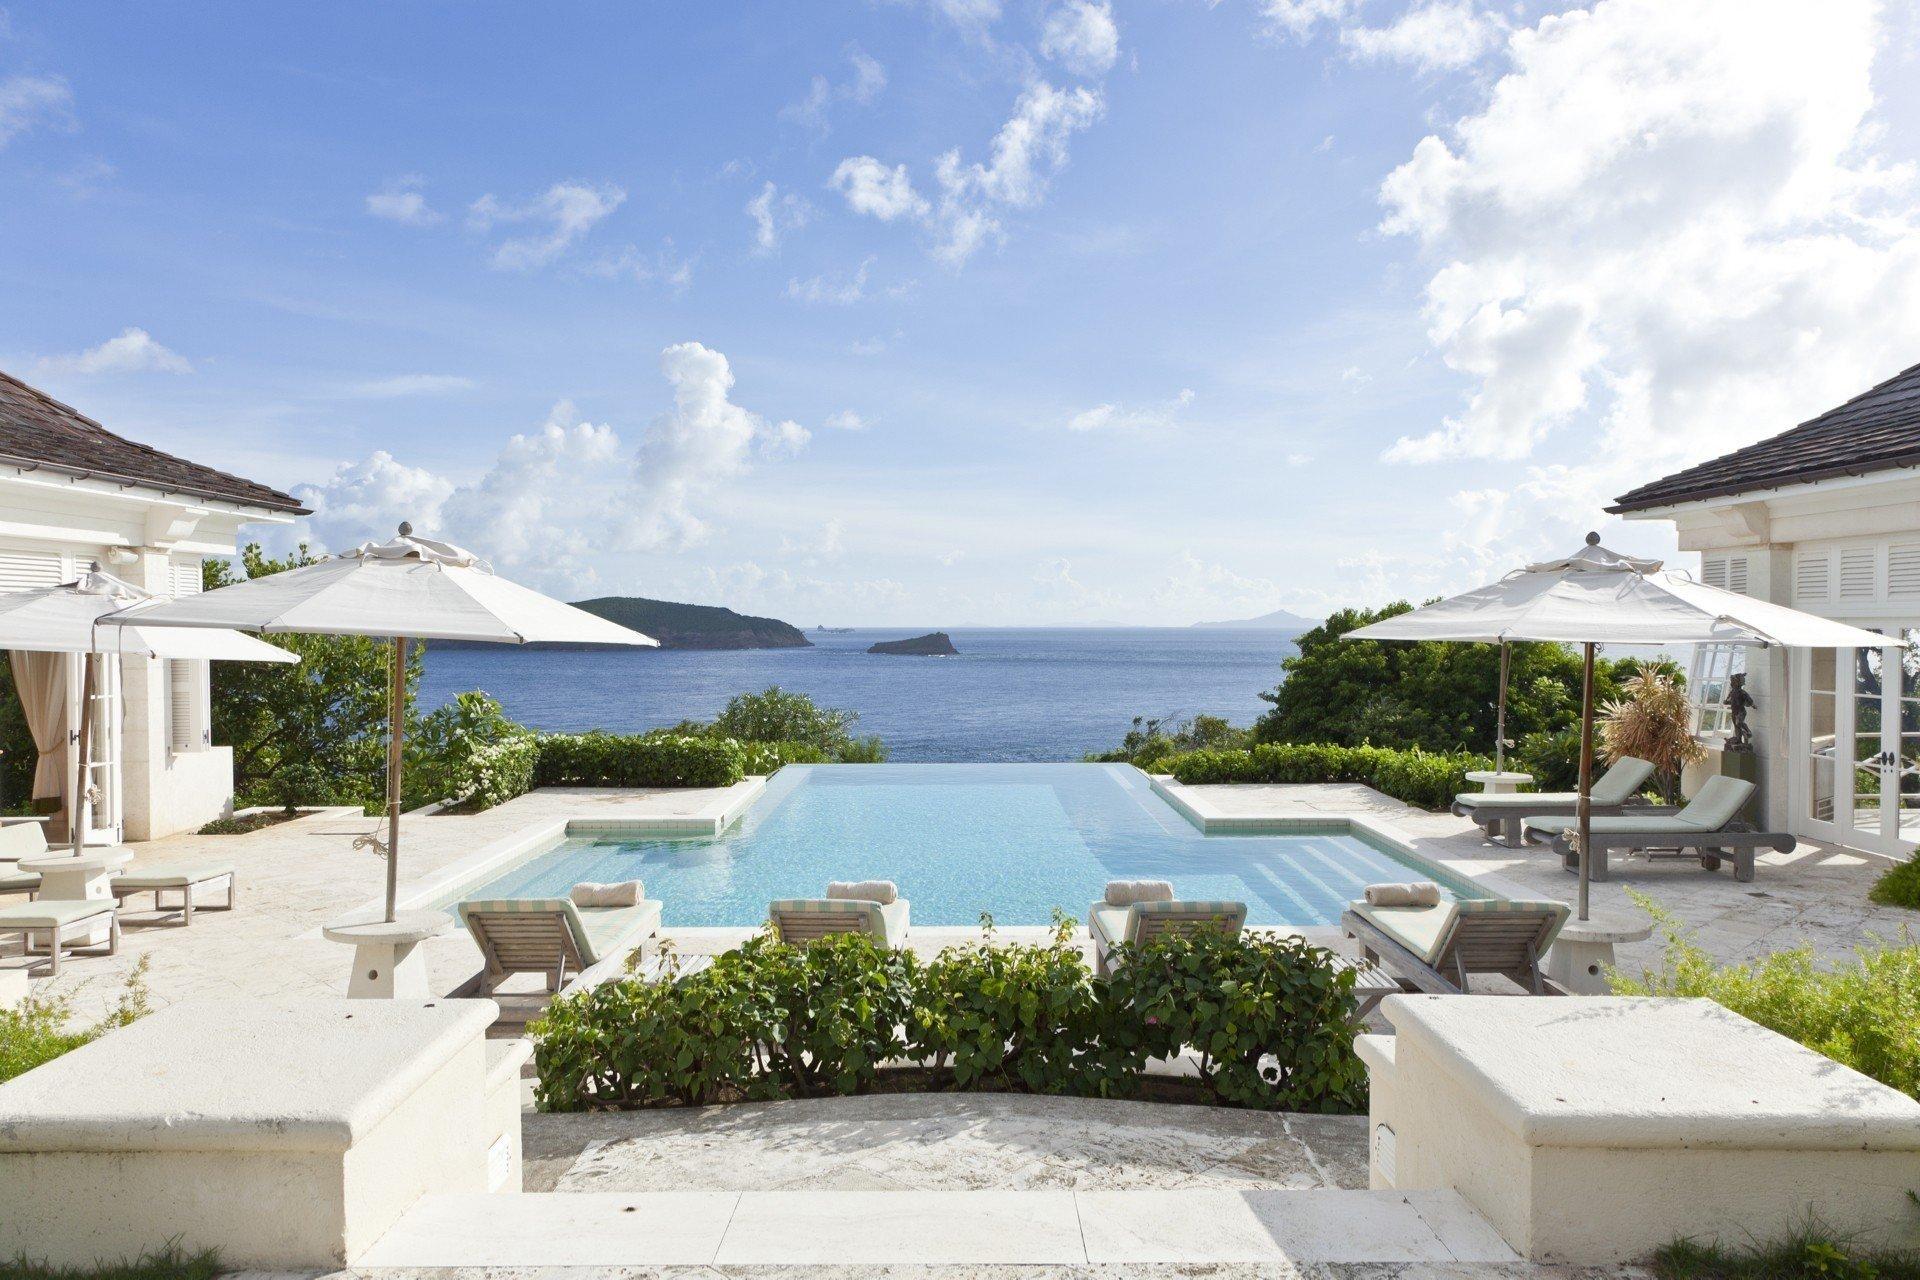 Villa Jolies Eaux - Mustique Island